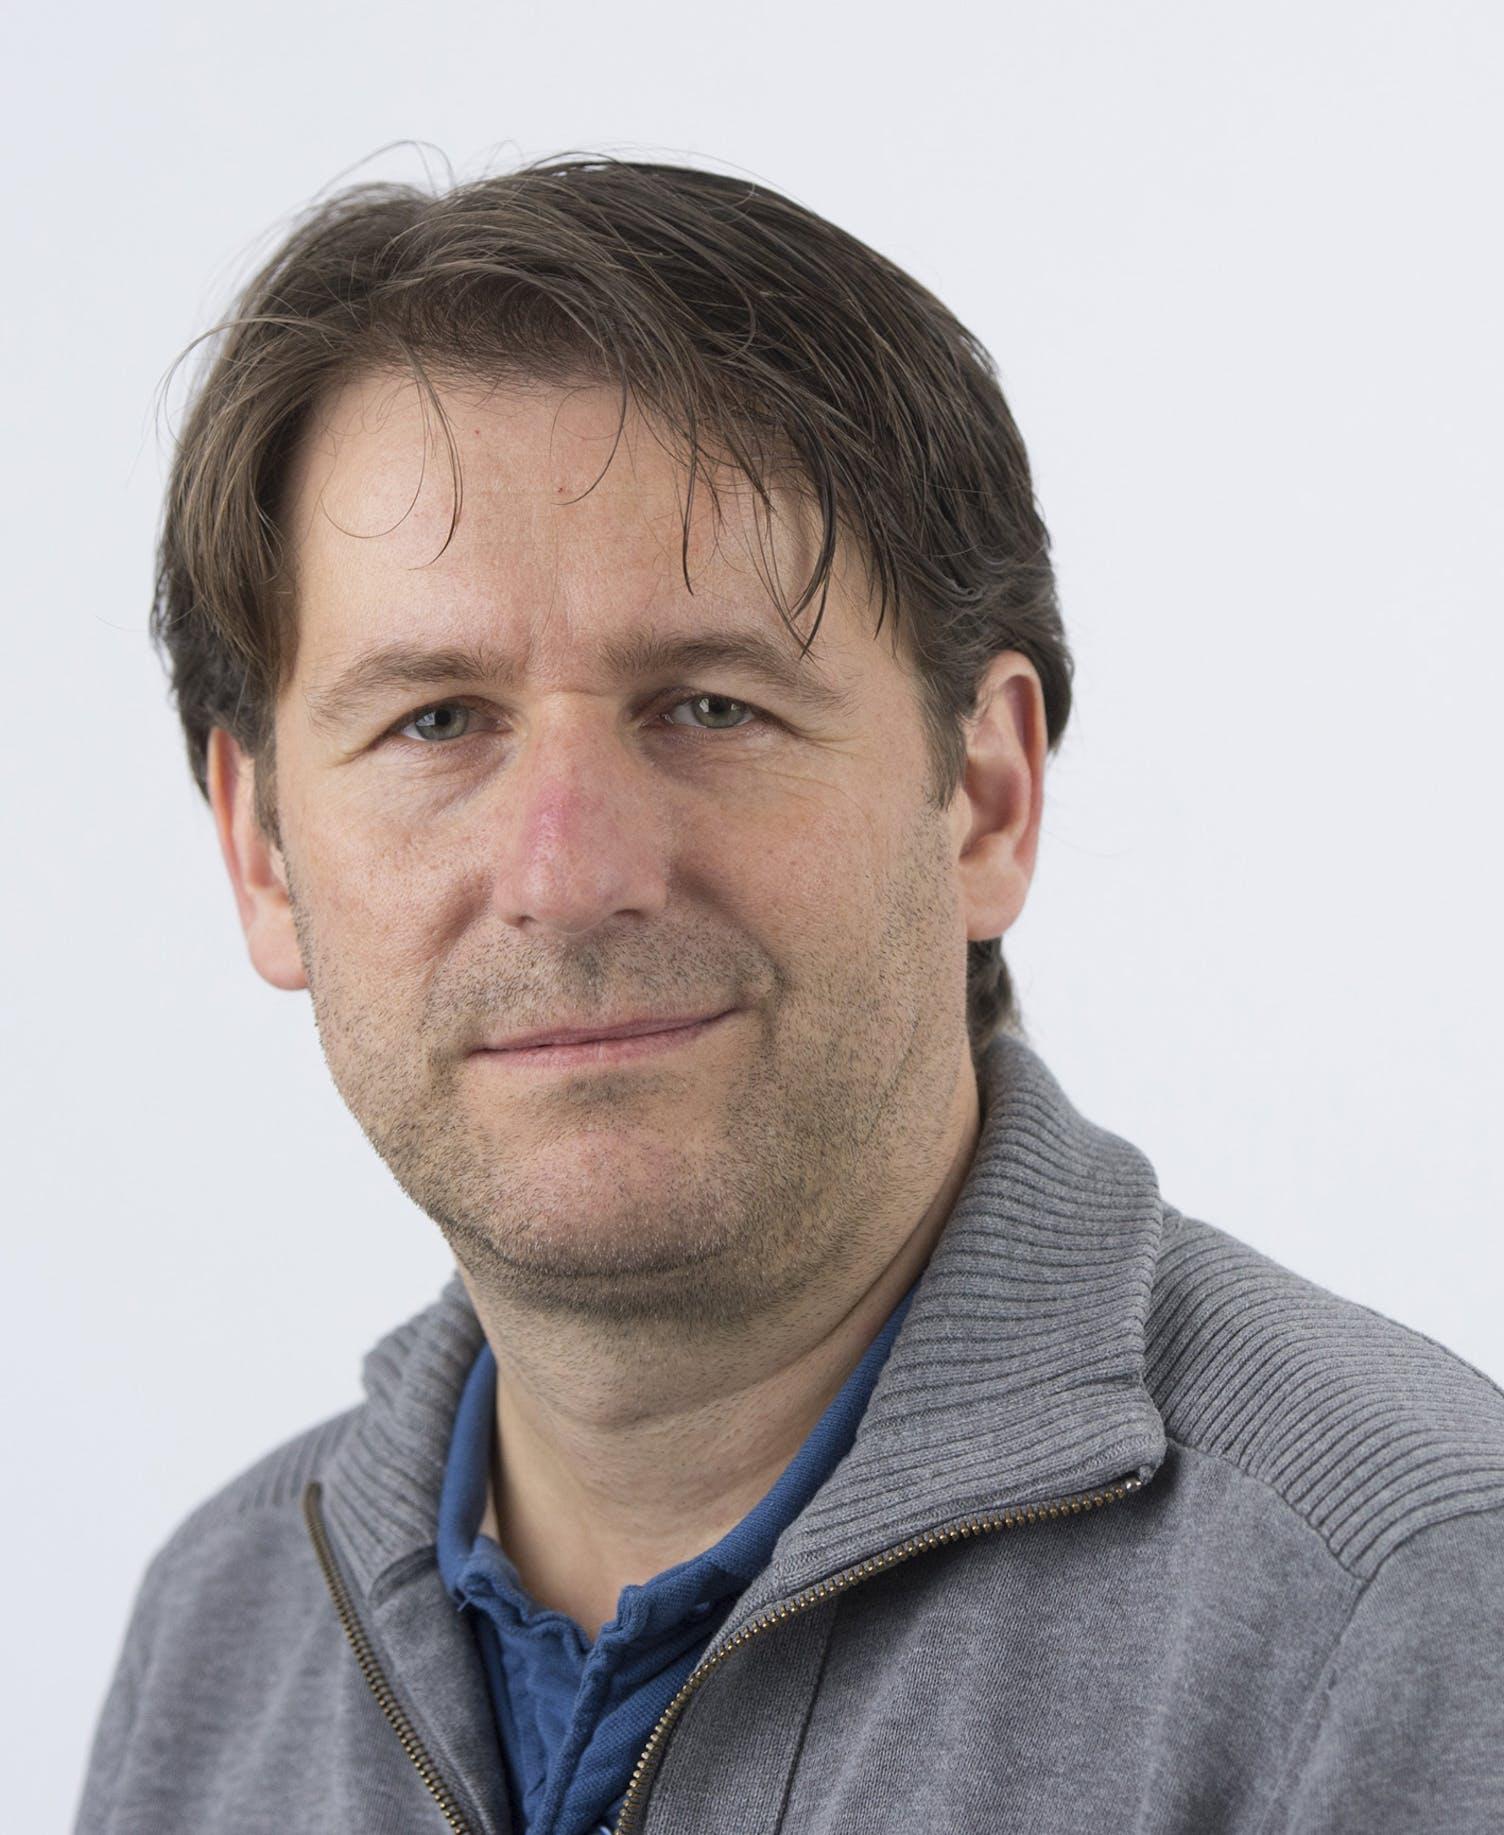 Markus Scherrer